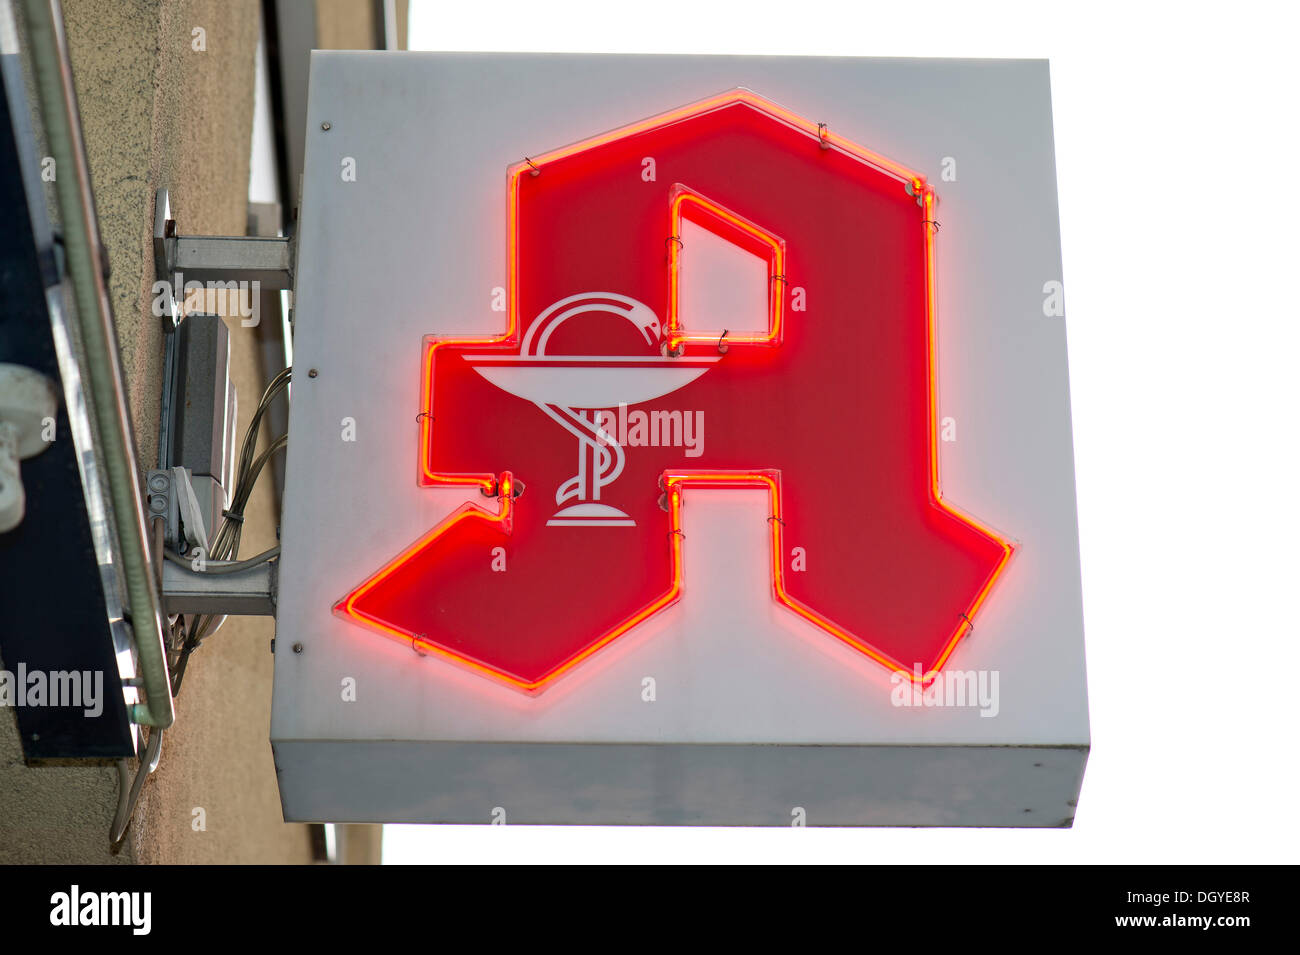 Pharmacy sign, pharmacy logo, a red letter A with the Aesculapian snake, pharmacy, Stuttgart, Baden-Wuerttemberg - Stock Image